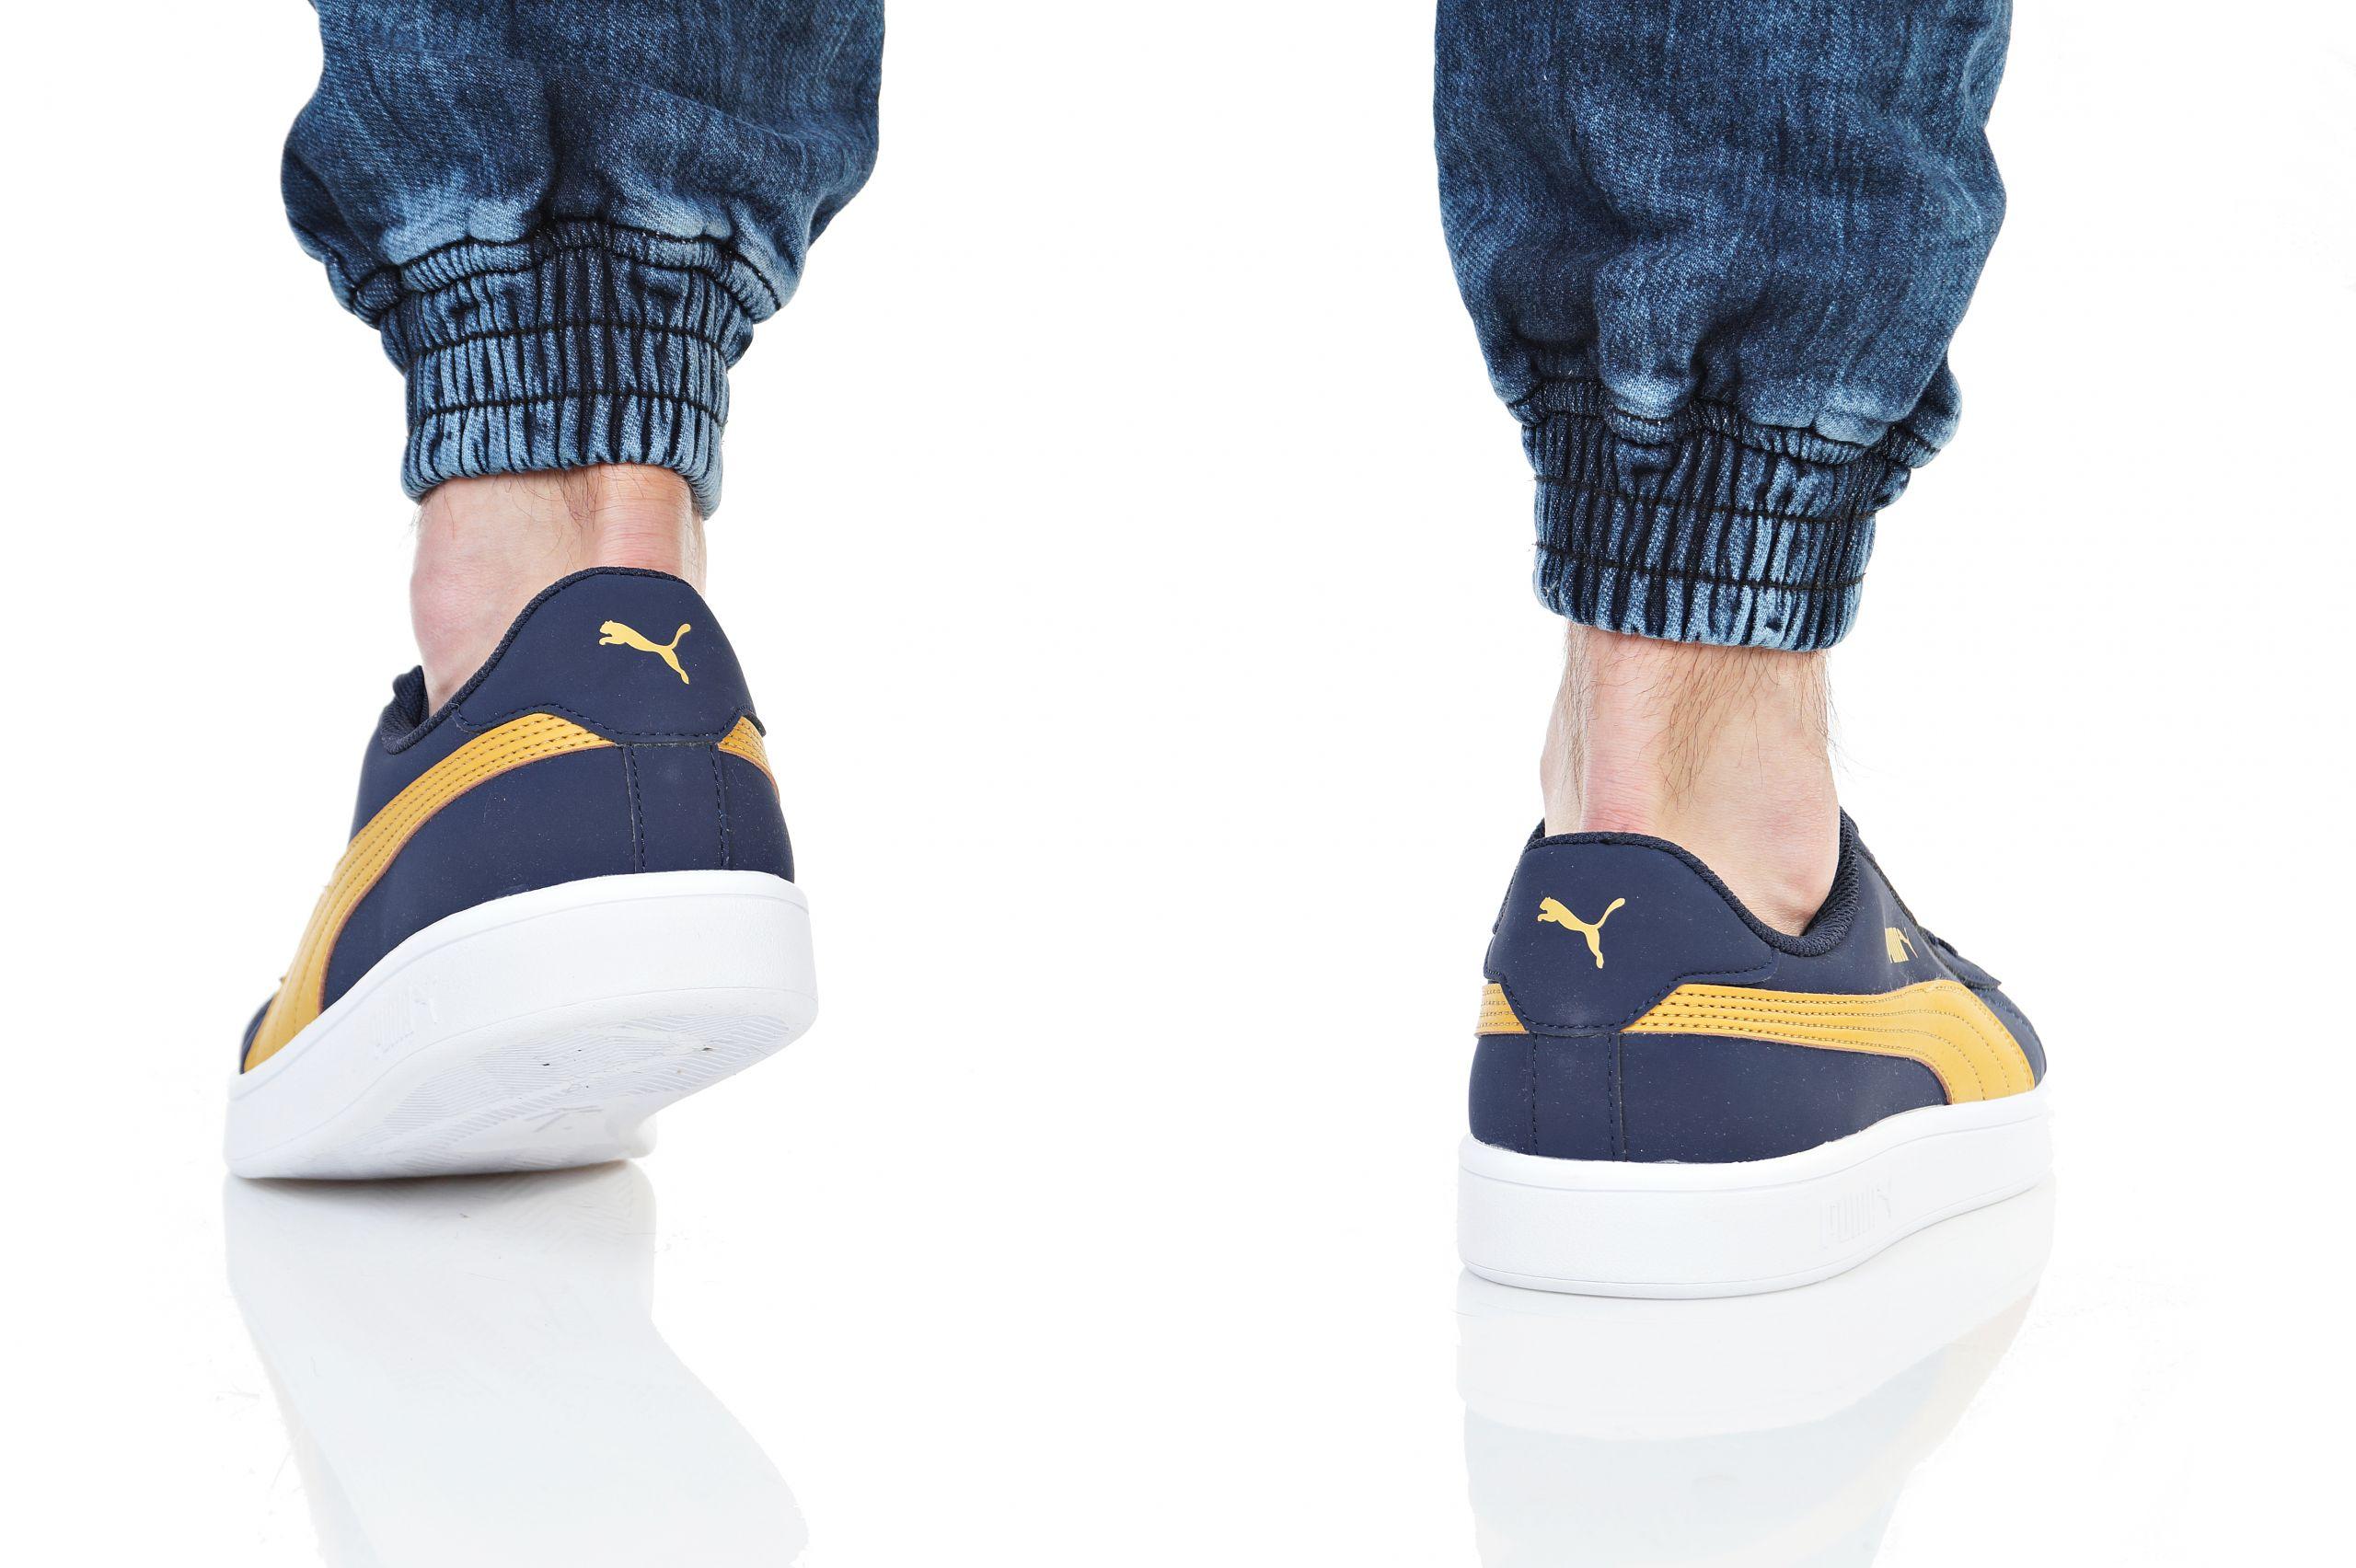 Puma Scarpe Sneakers Sportive Smash v2 Buck Peacoat Blu Nubuck